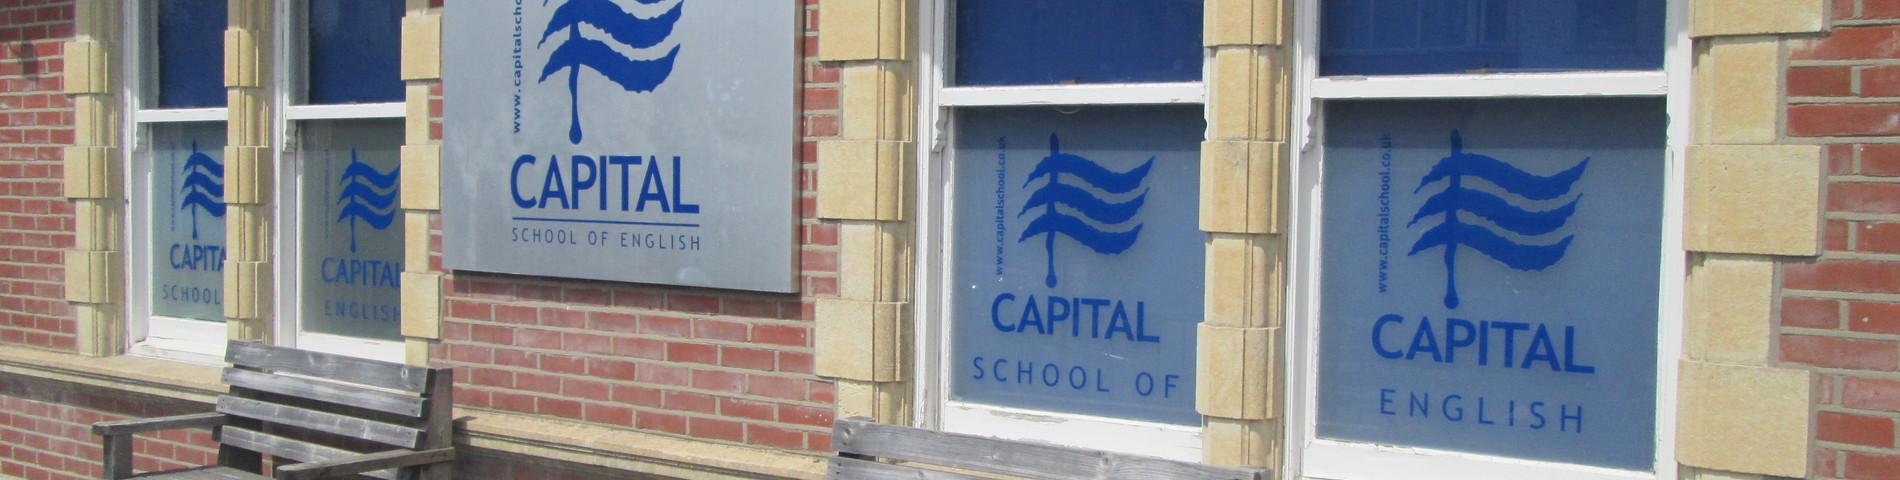 Capital School of English photo 1